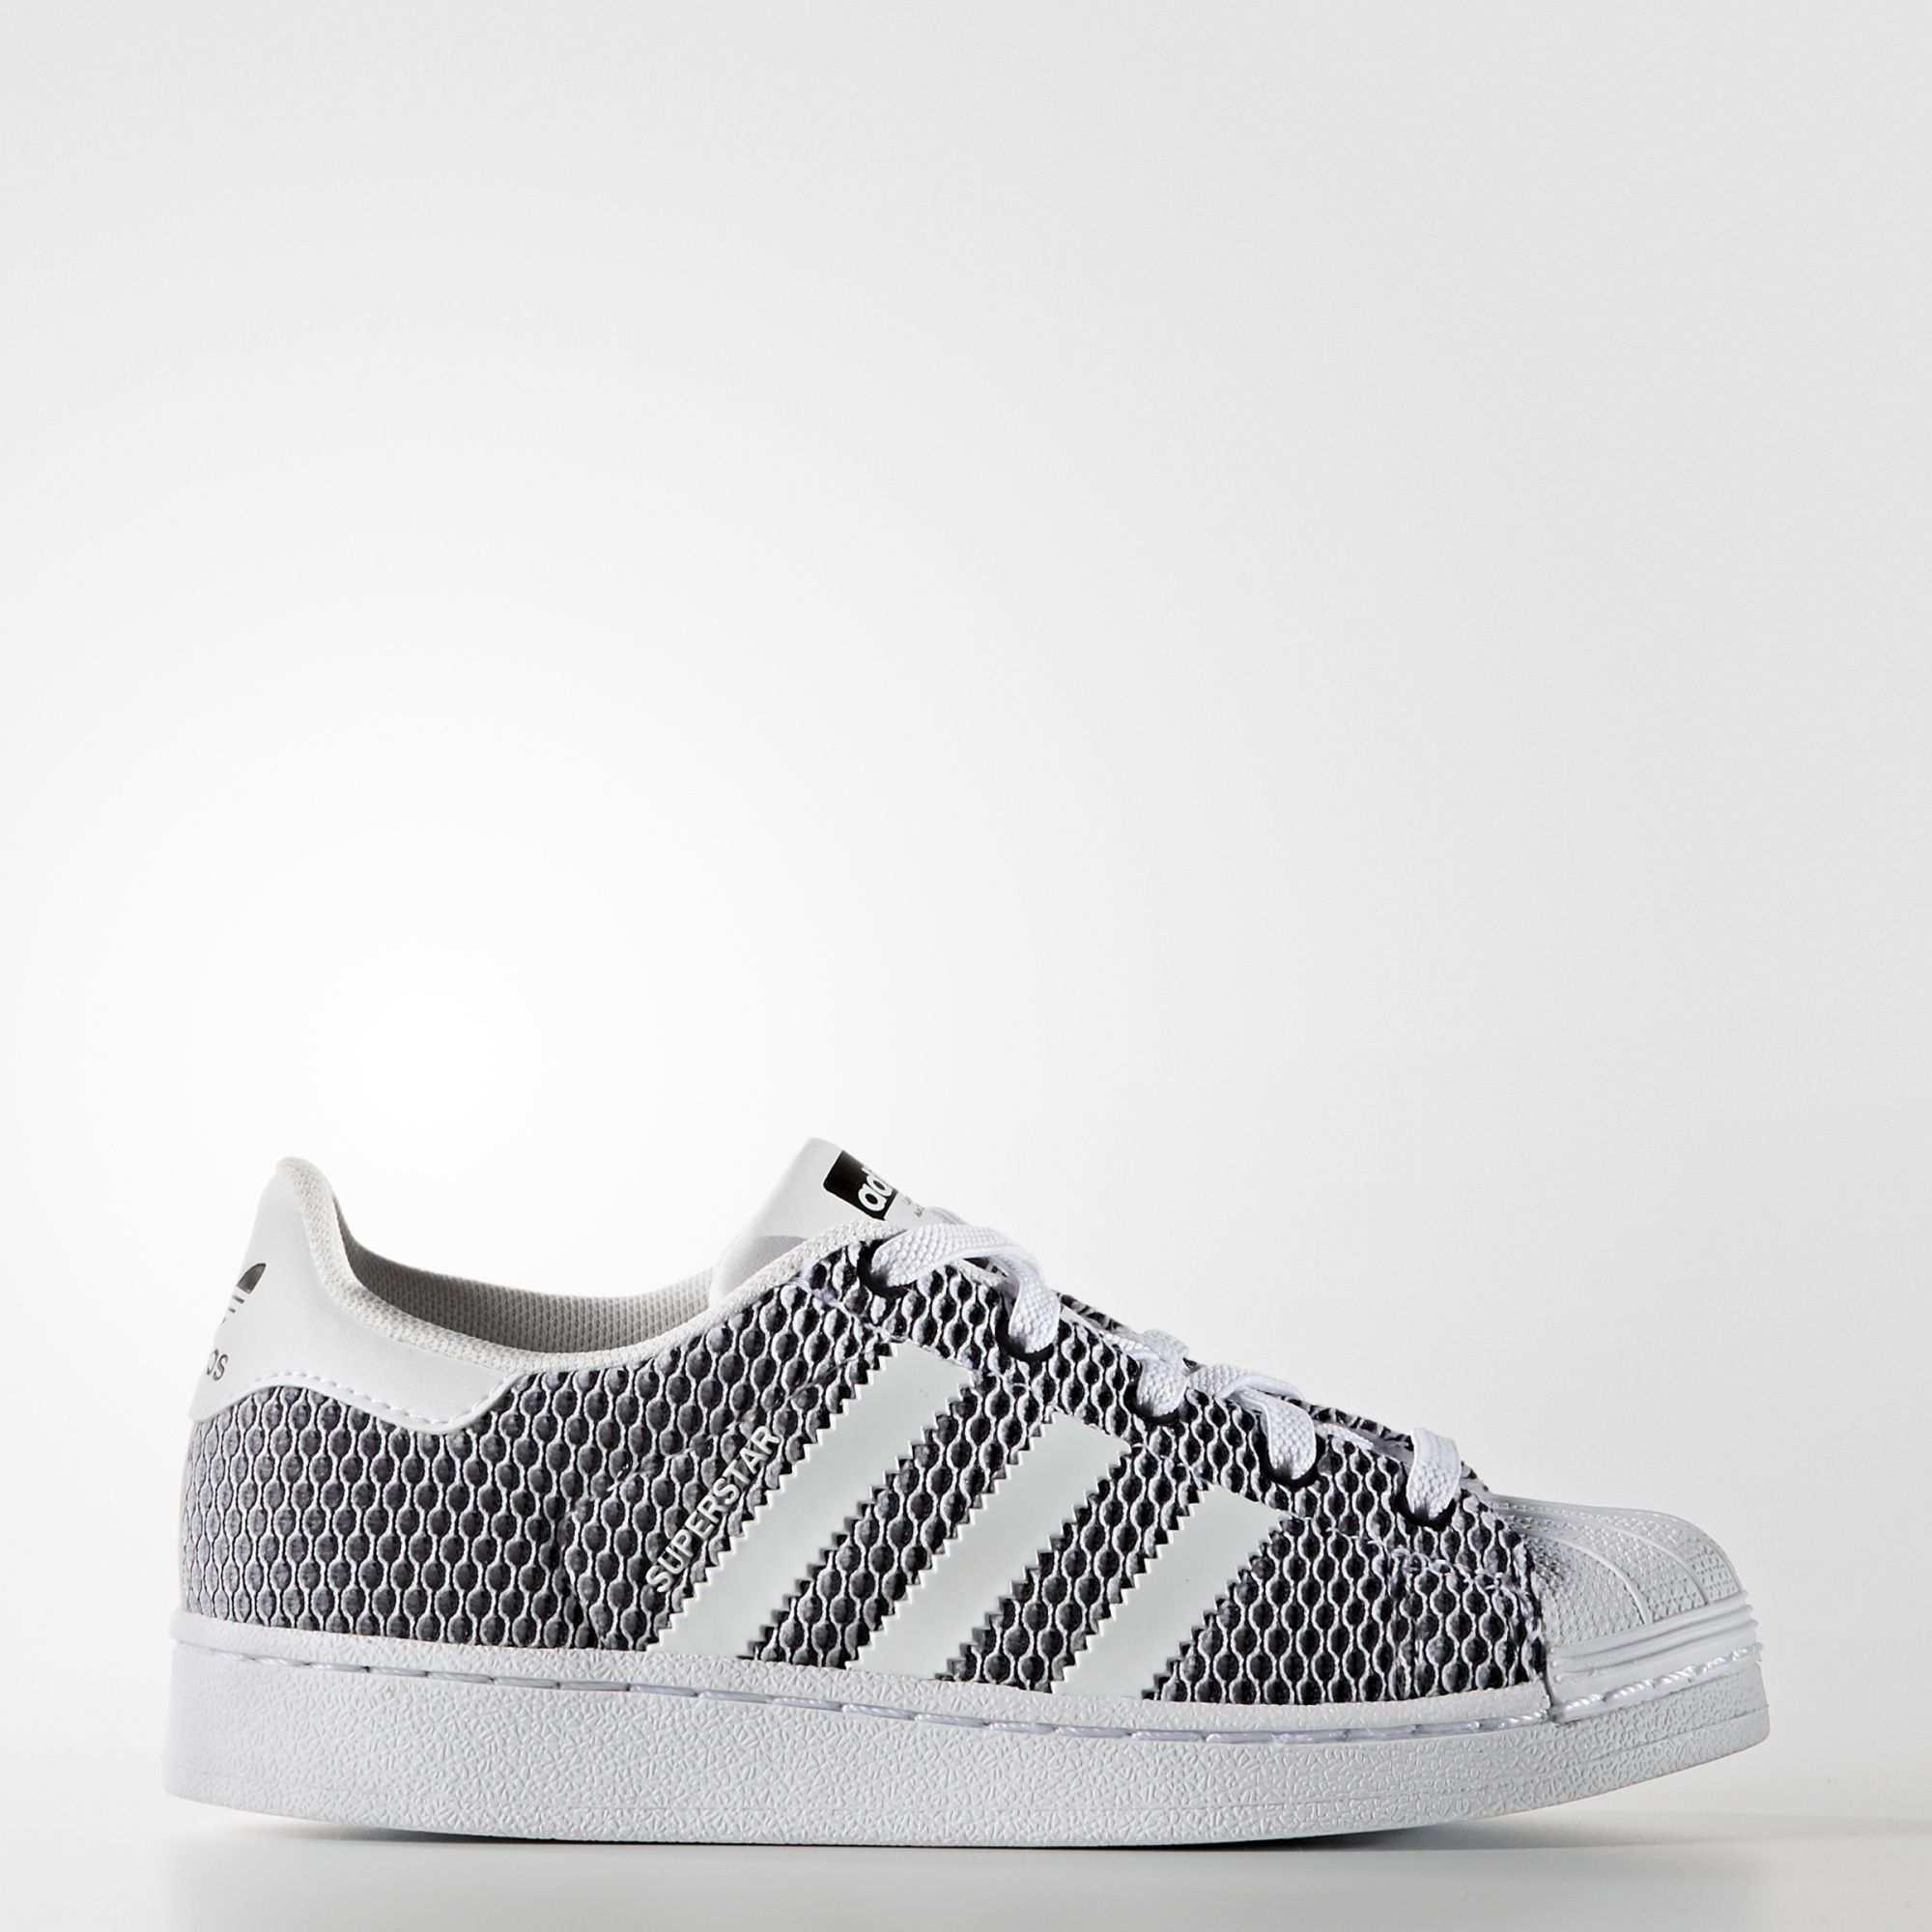 Adidas Superstar Colour Shift Schuh Schwarz Adidas Deutschland Adidas Superstar Sneaker Adidas Superstar Sneaker